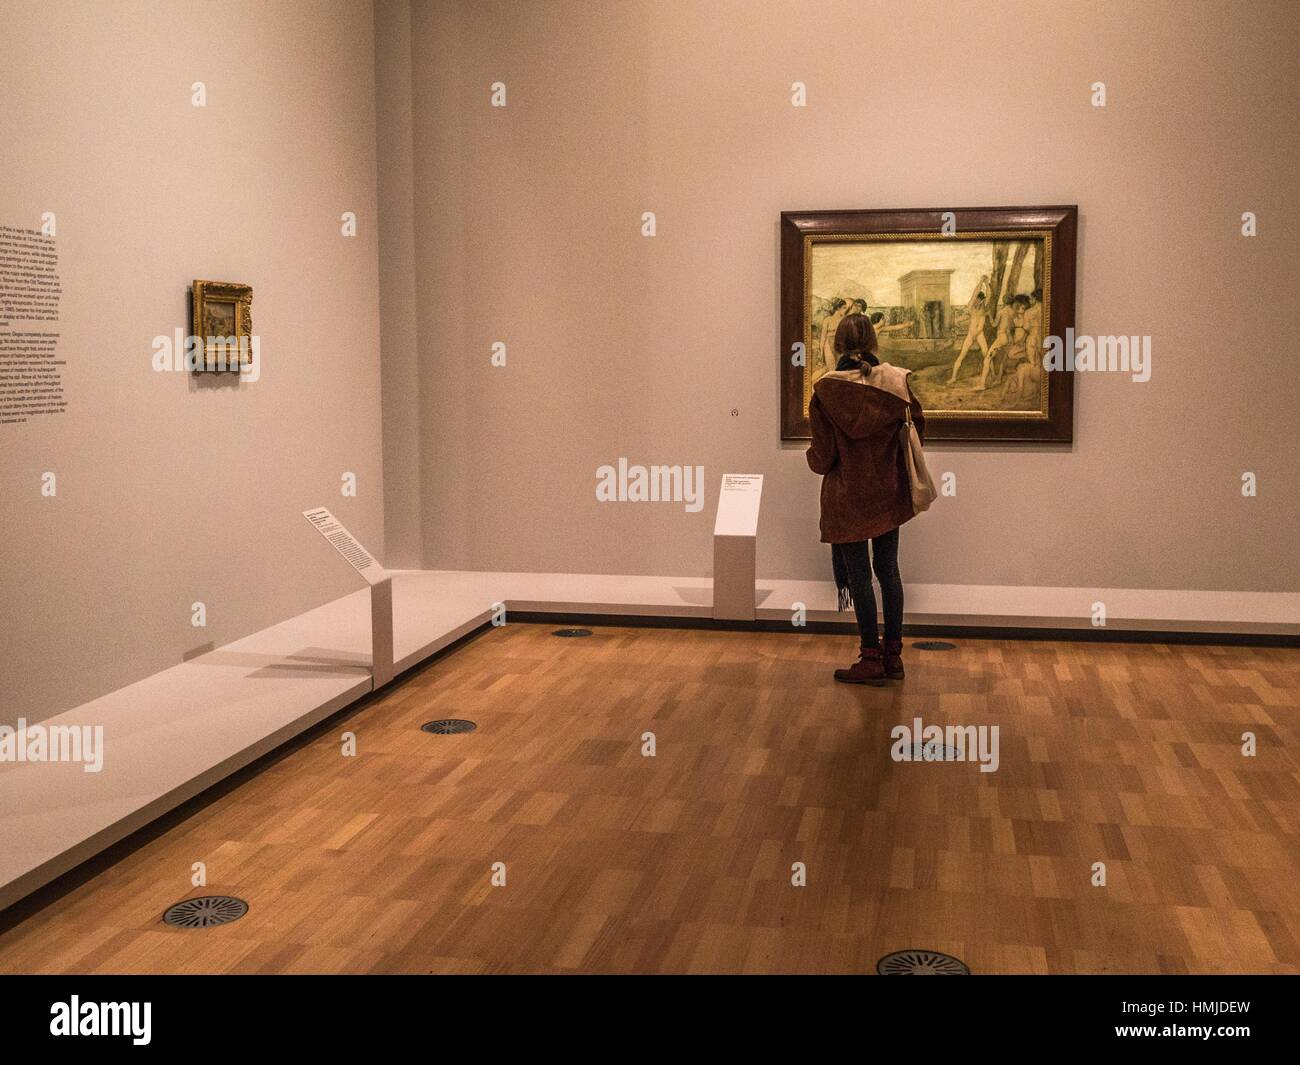 People wander around anart exhibition (Degas) in Melbourne, Victoria, Australia. Stock Photo